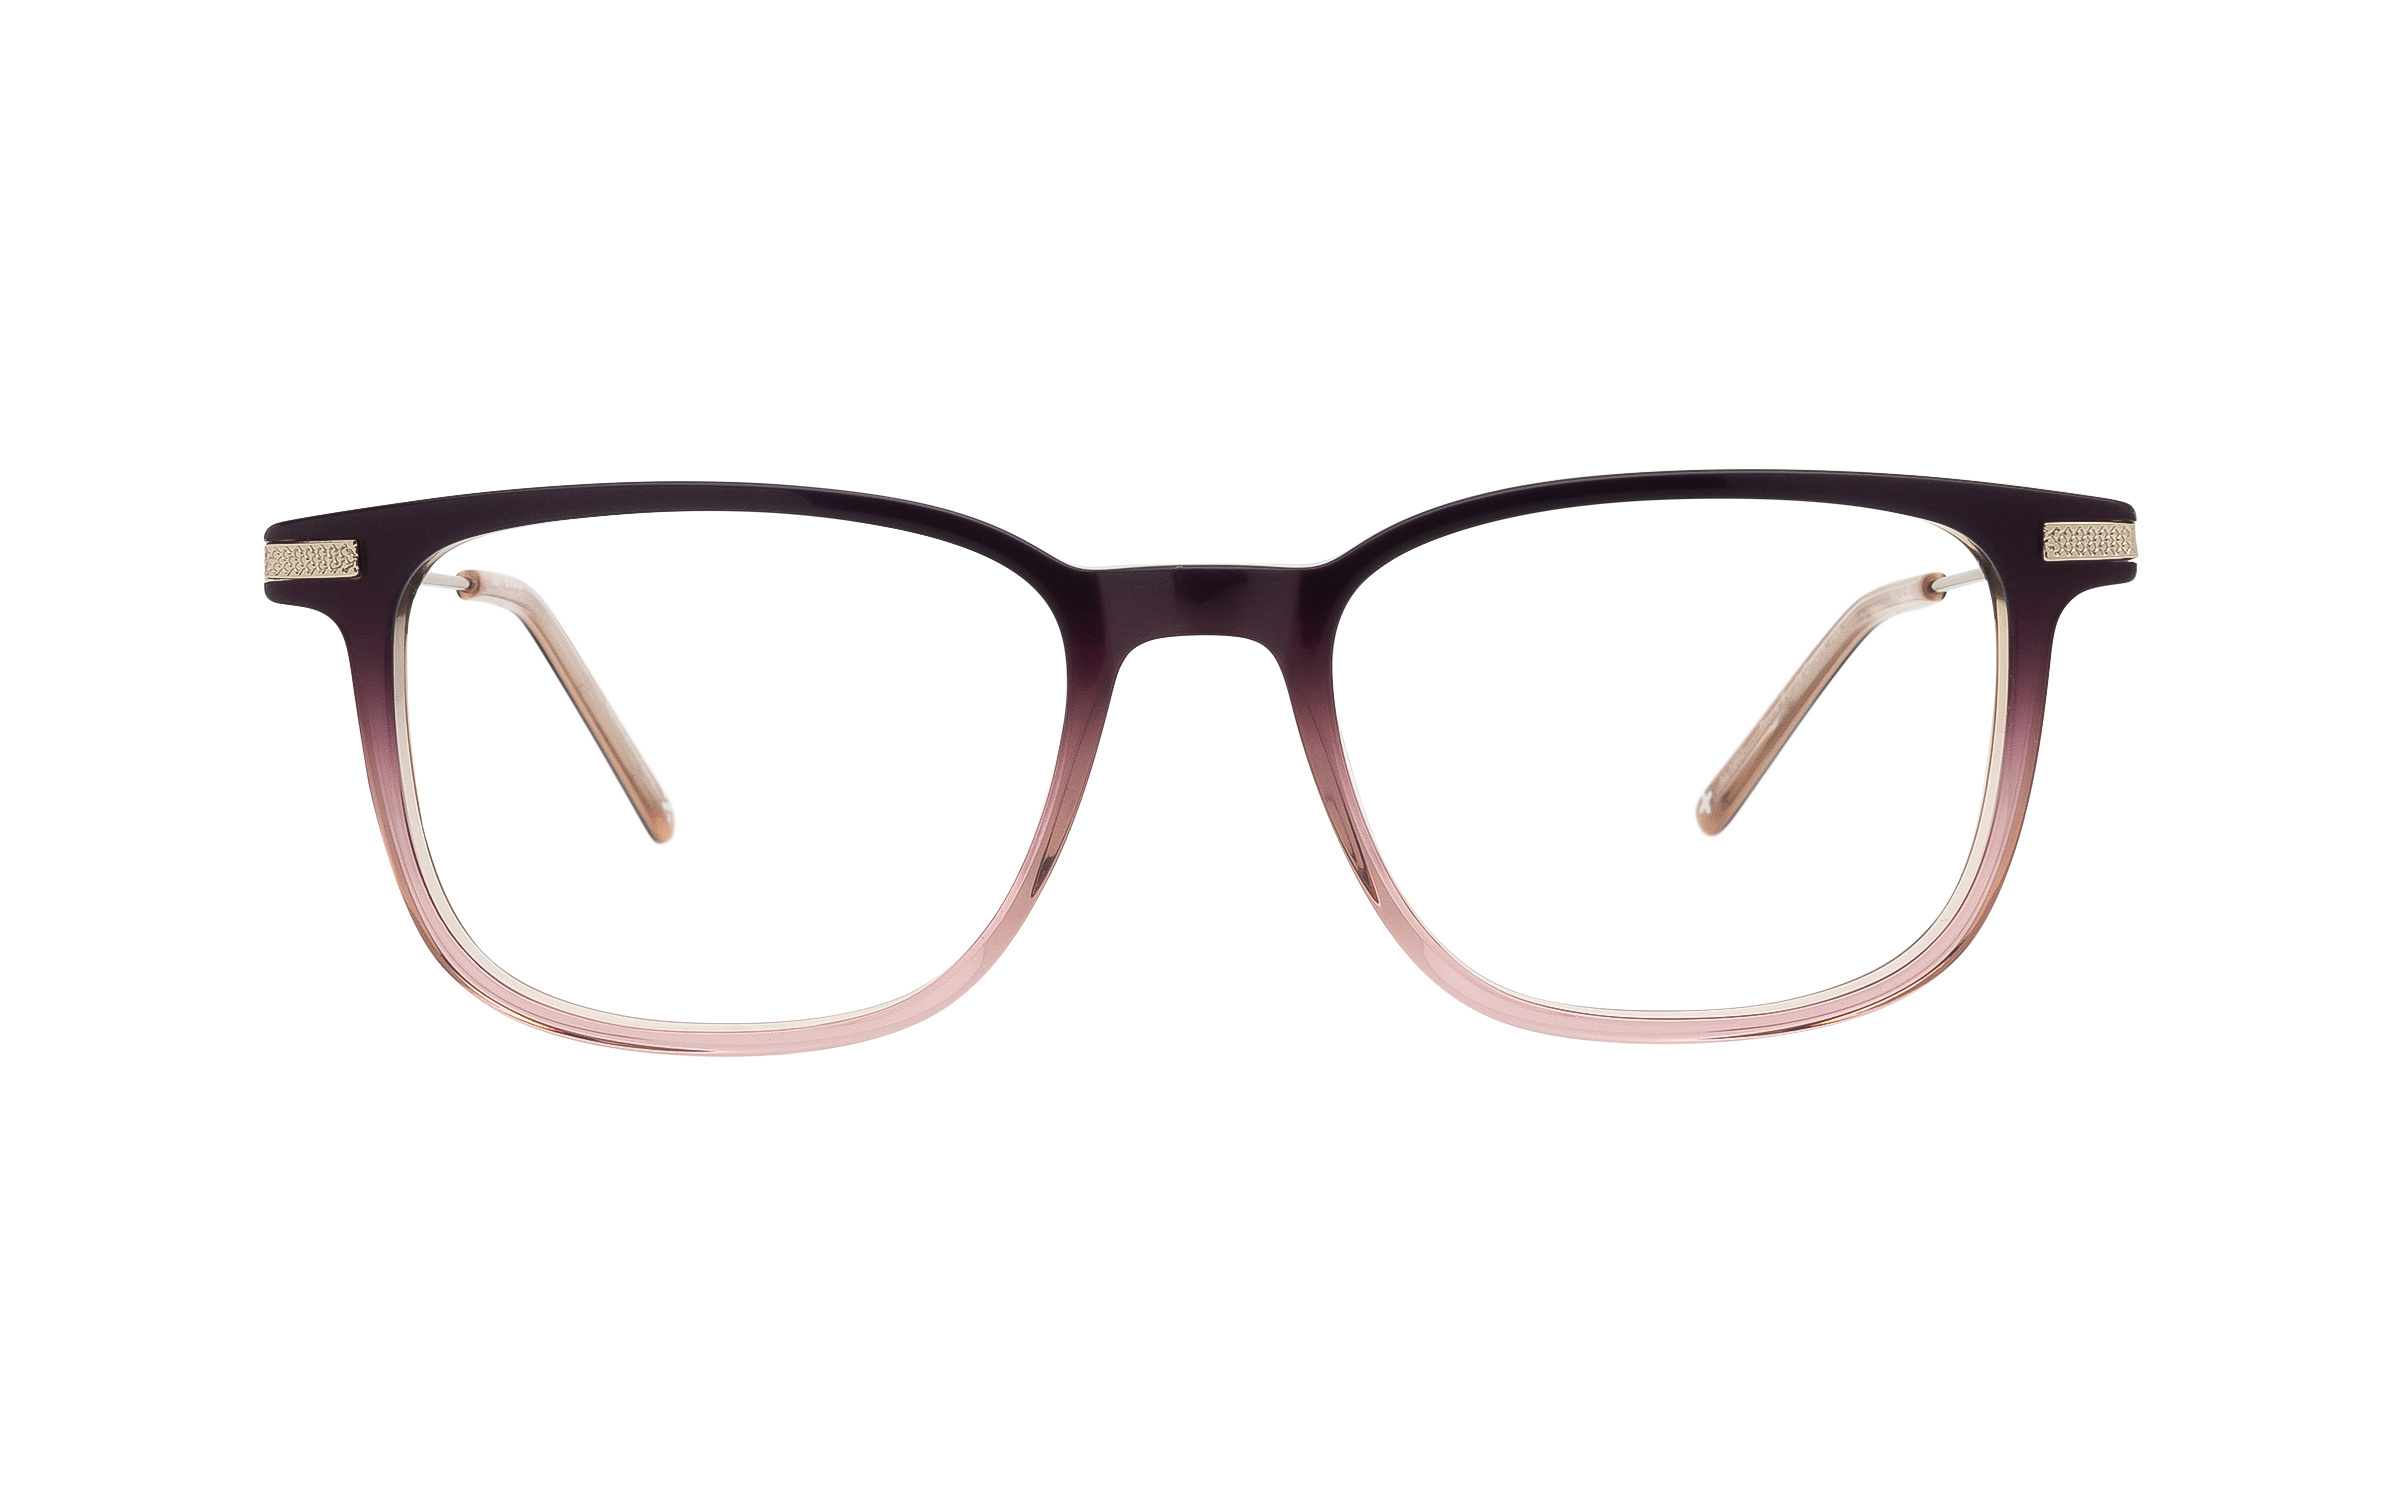 coastal.com - Derek Cardigan Dione (52) Eyeglasses and Frame in Ombre Purple | Acetate/Metal – Online Coastal 55.00 USD